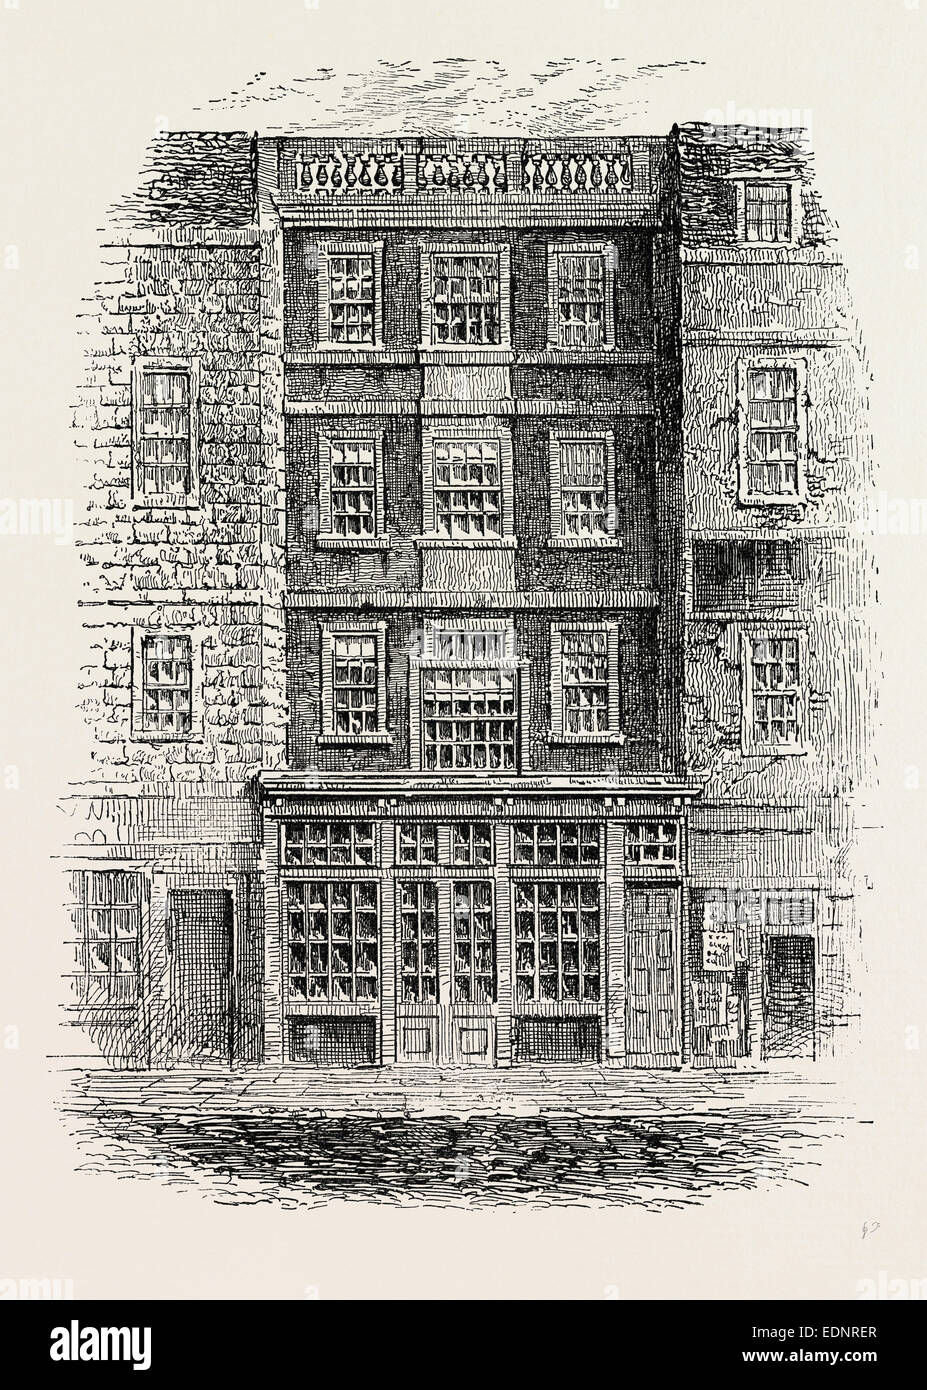 JONATHAN WILD'S HOUSE. London, UK, 19th century engraving - Stock Image